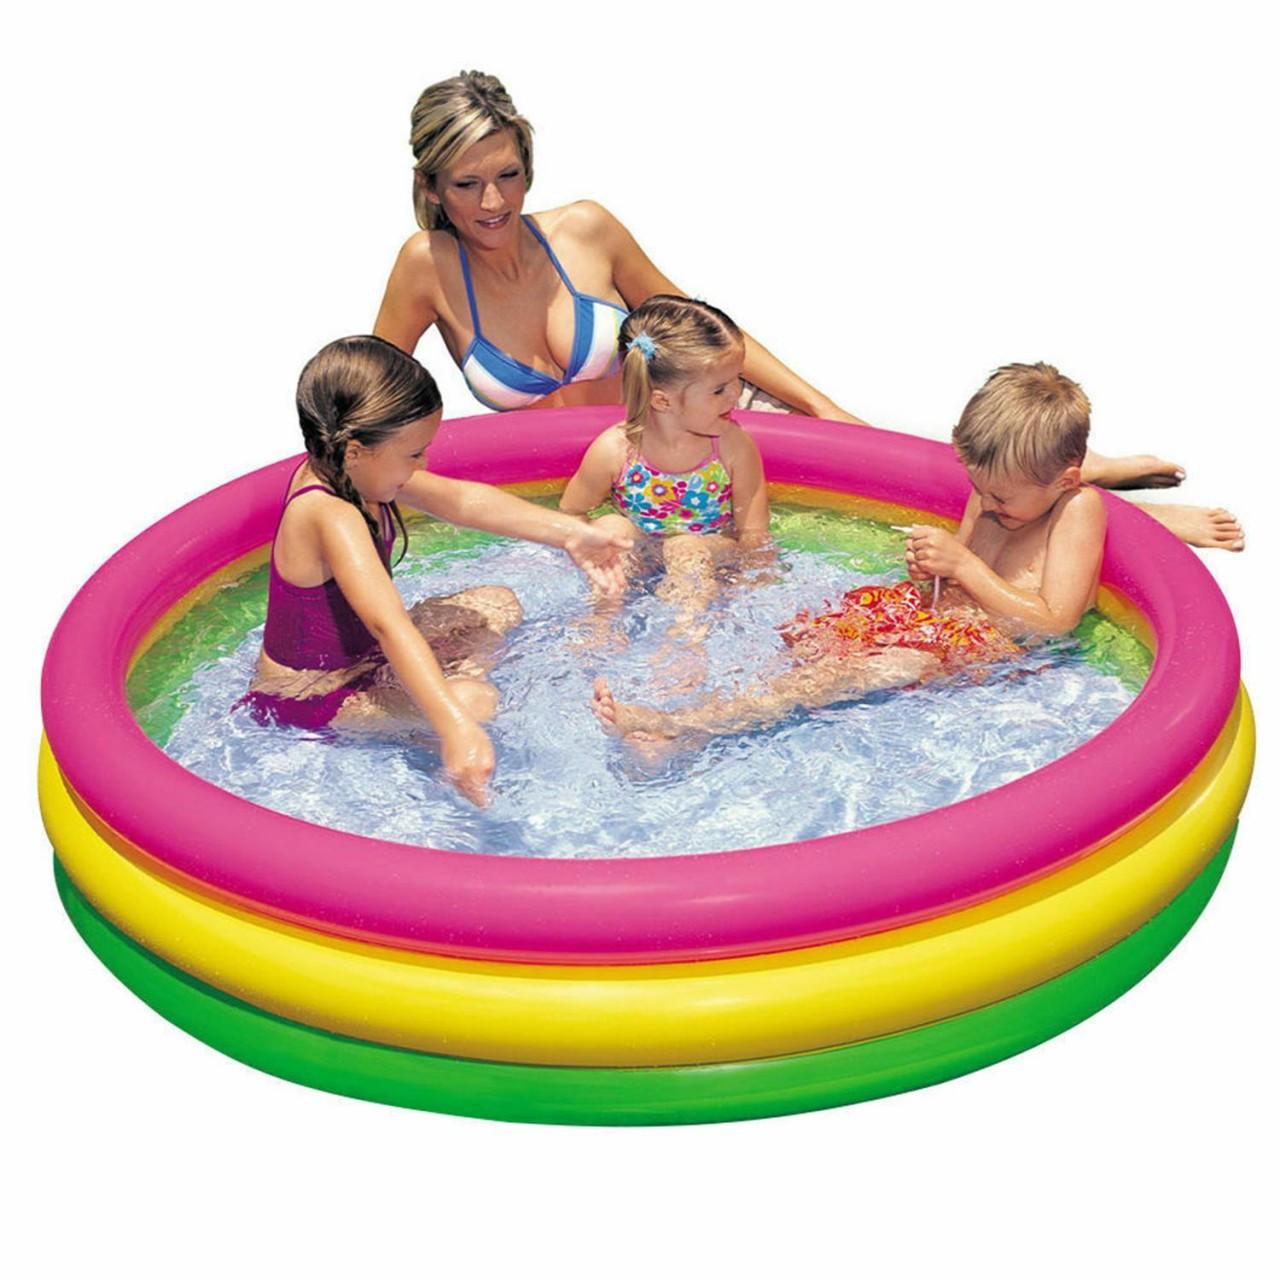 Intex Planschbecken aufblasbarer Babypool Kinderpool Schwimmbad 144x25cm 57412